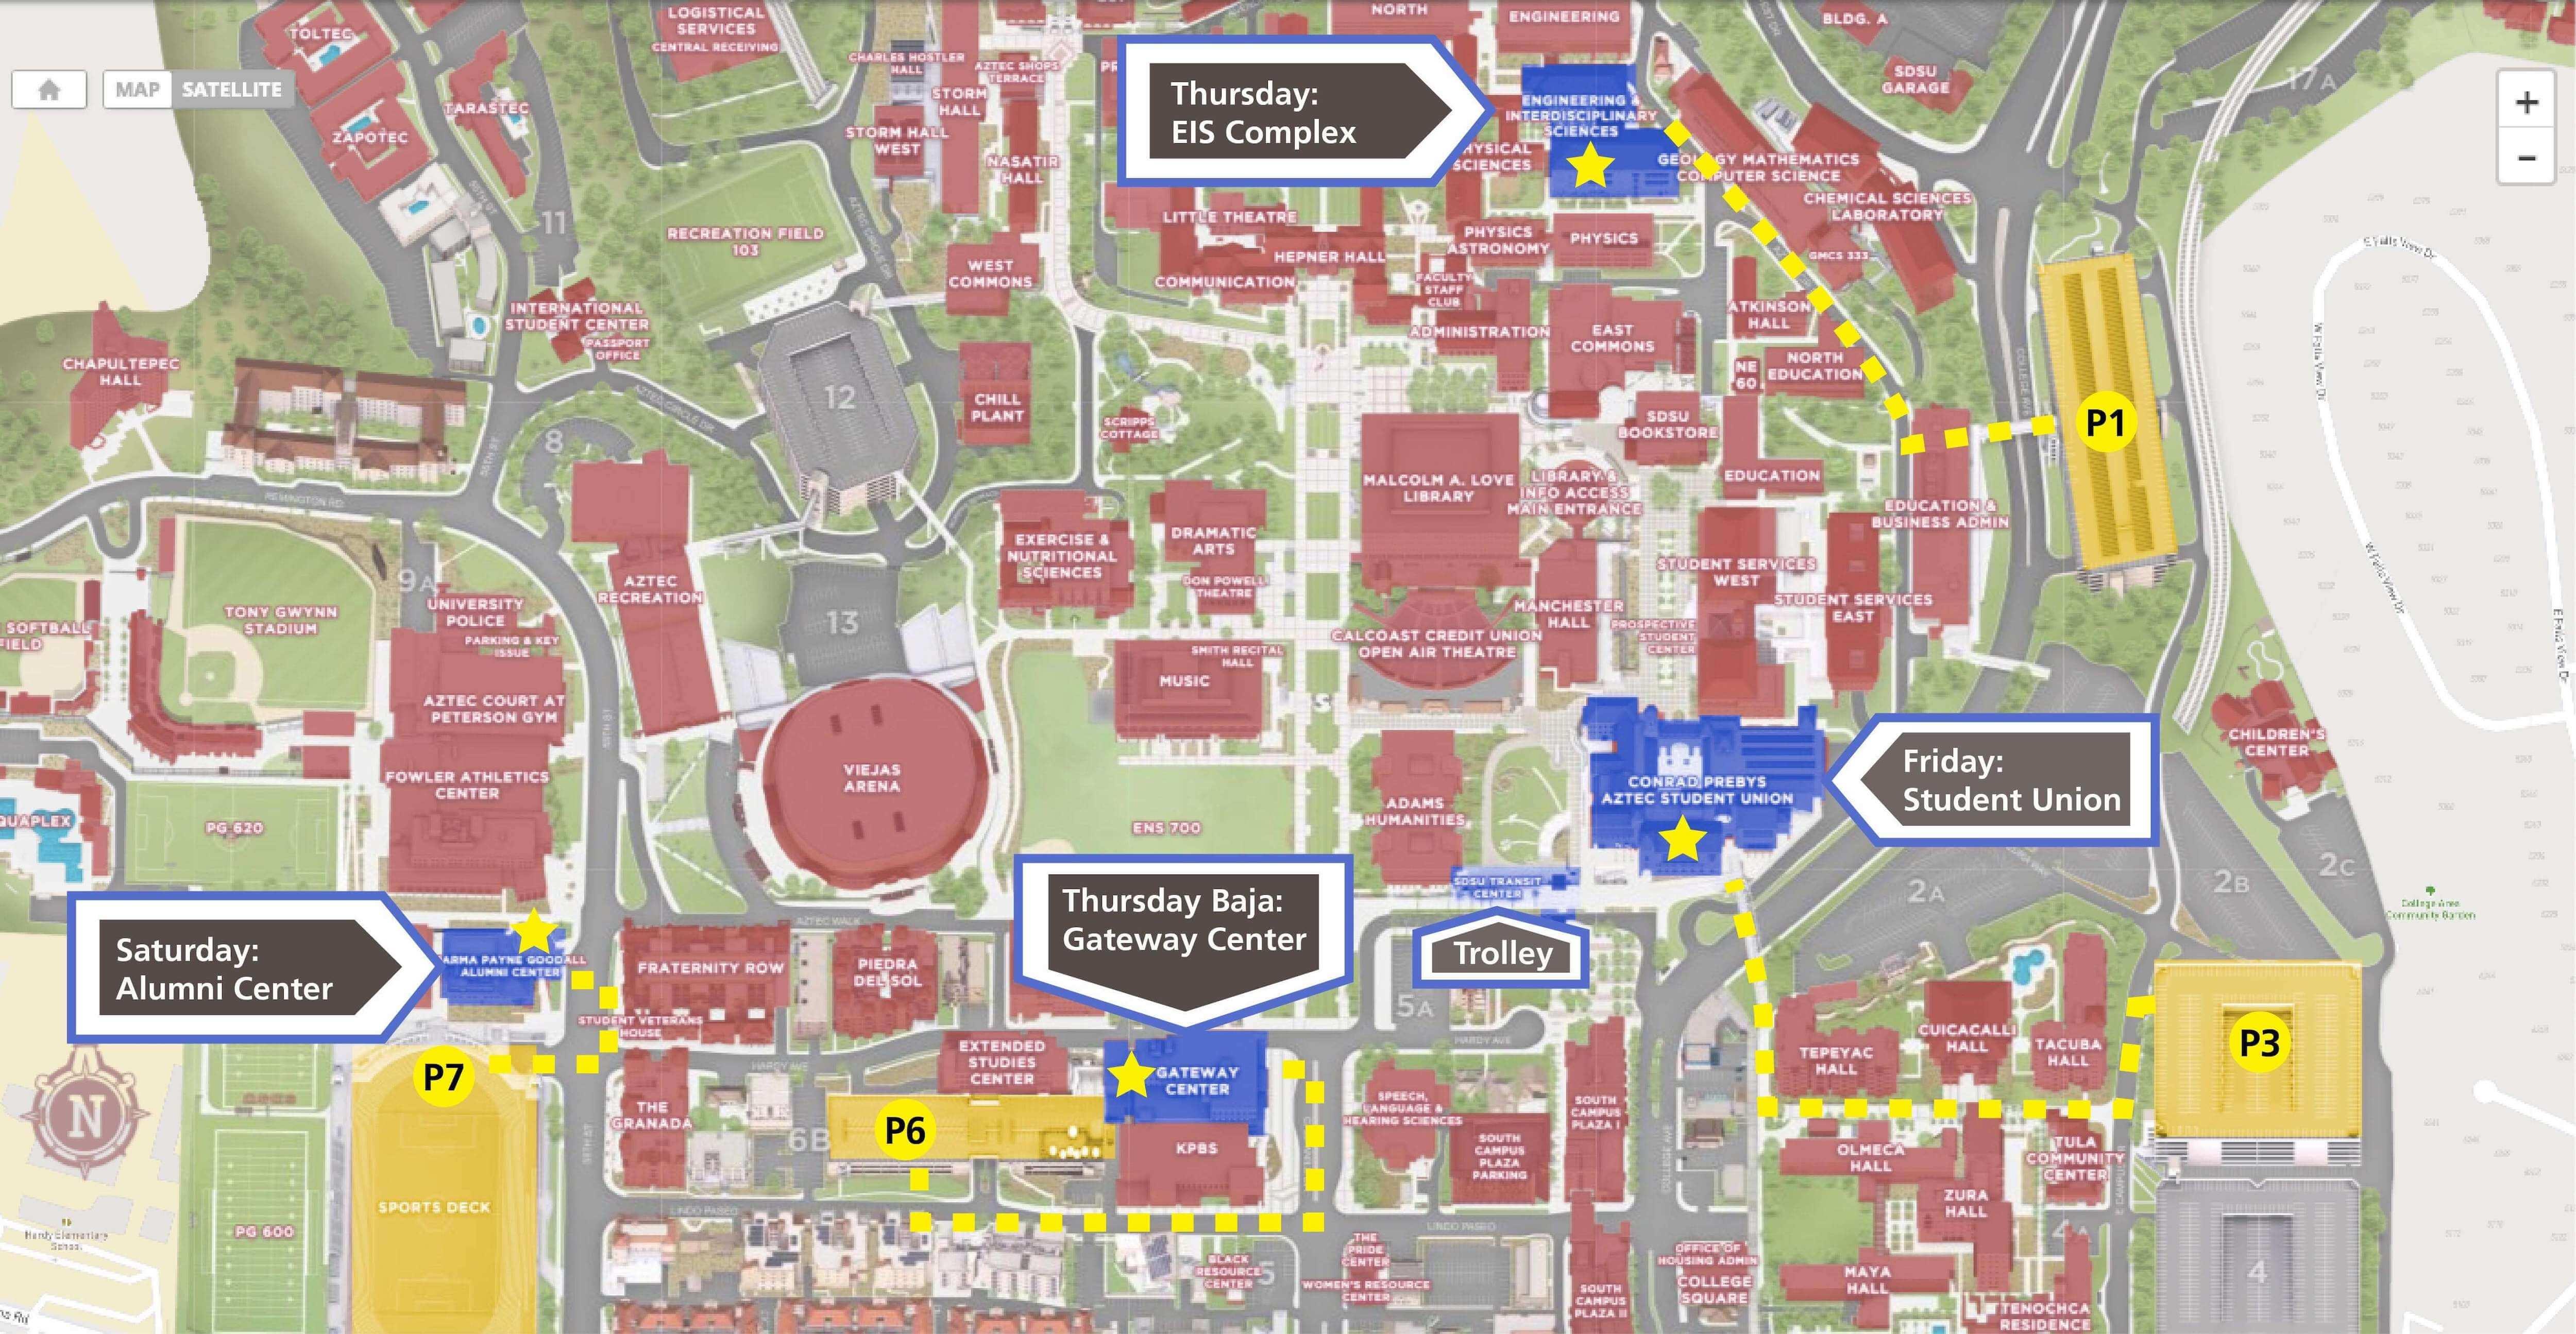 sdsu campus map 2015 Entrepreneurship Conference 2019 Programs Lavin